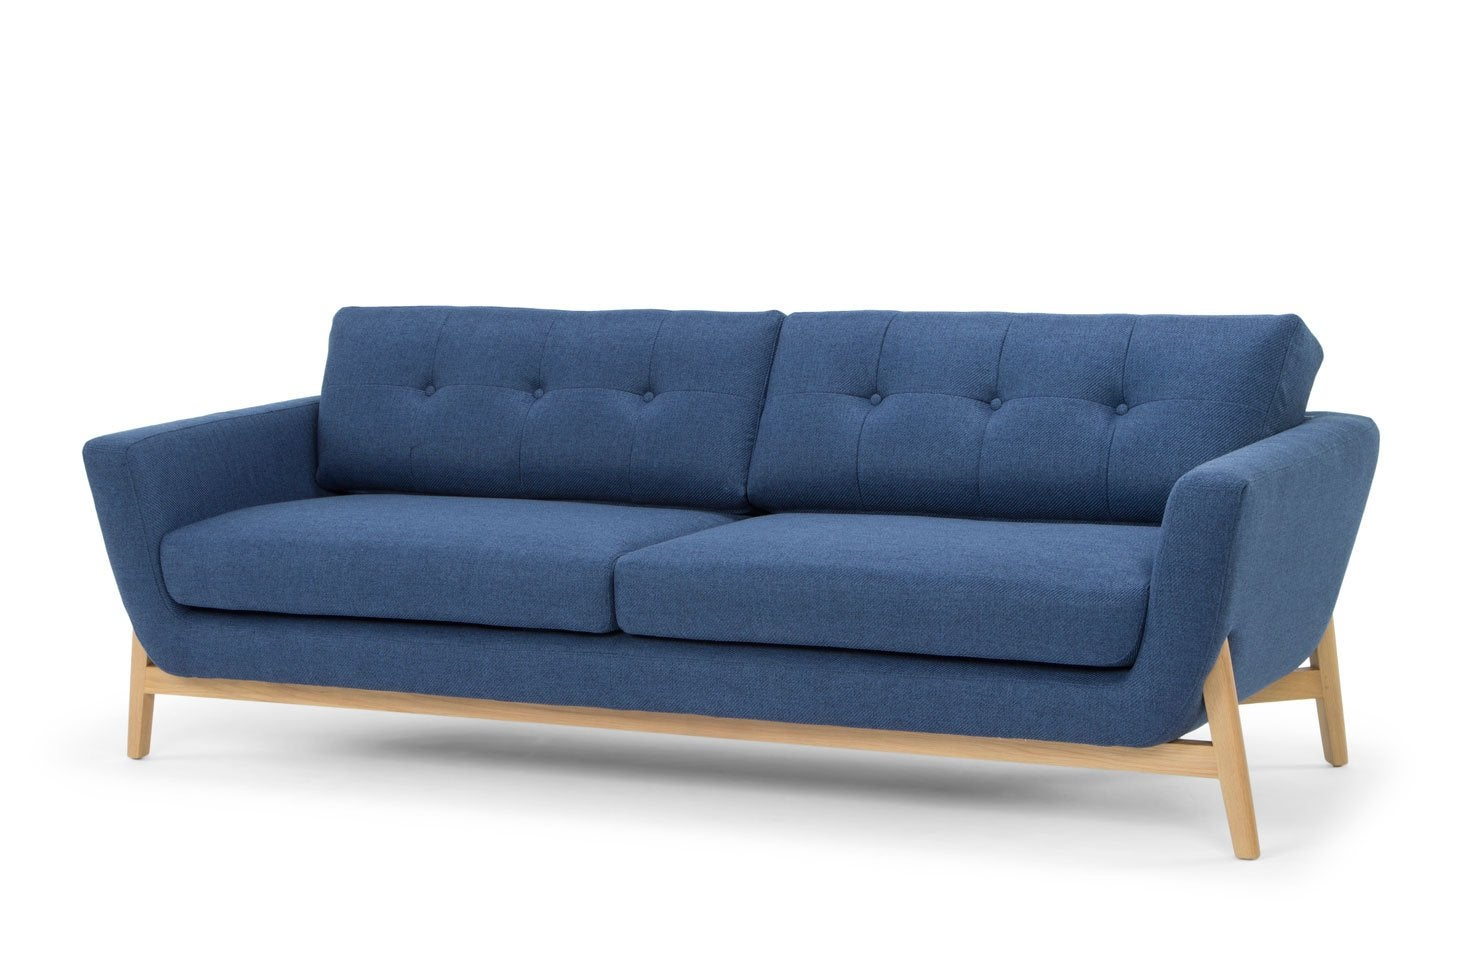 Helgrim 3 Seater Fabric Sofa - Navy